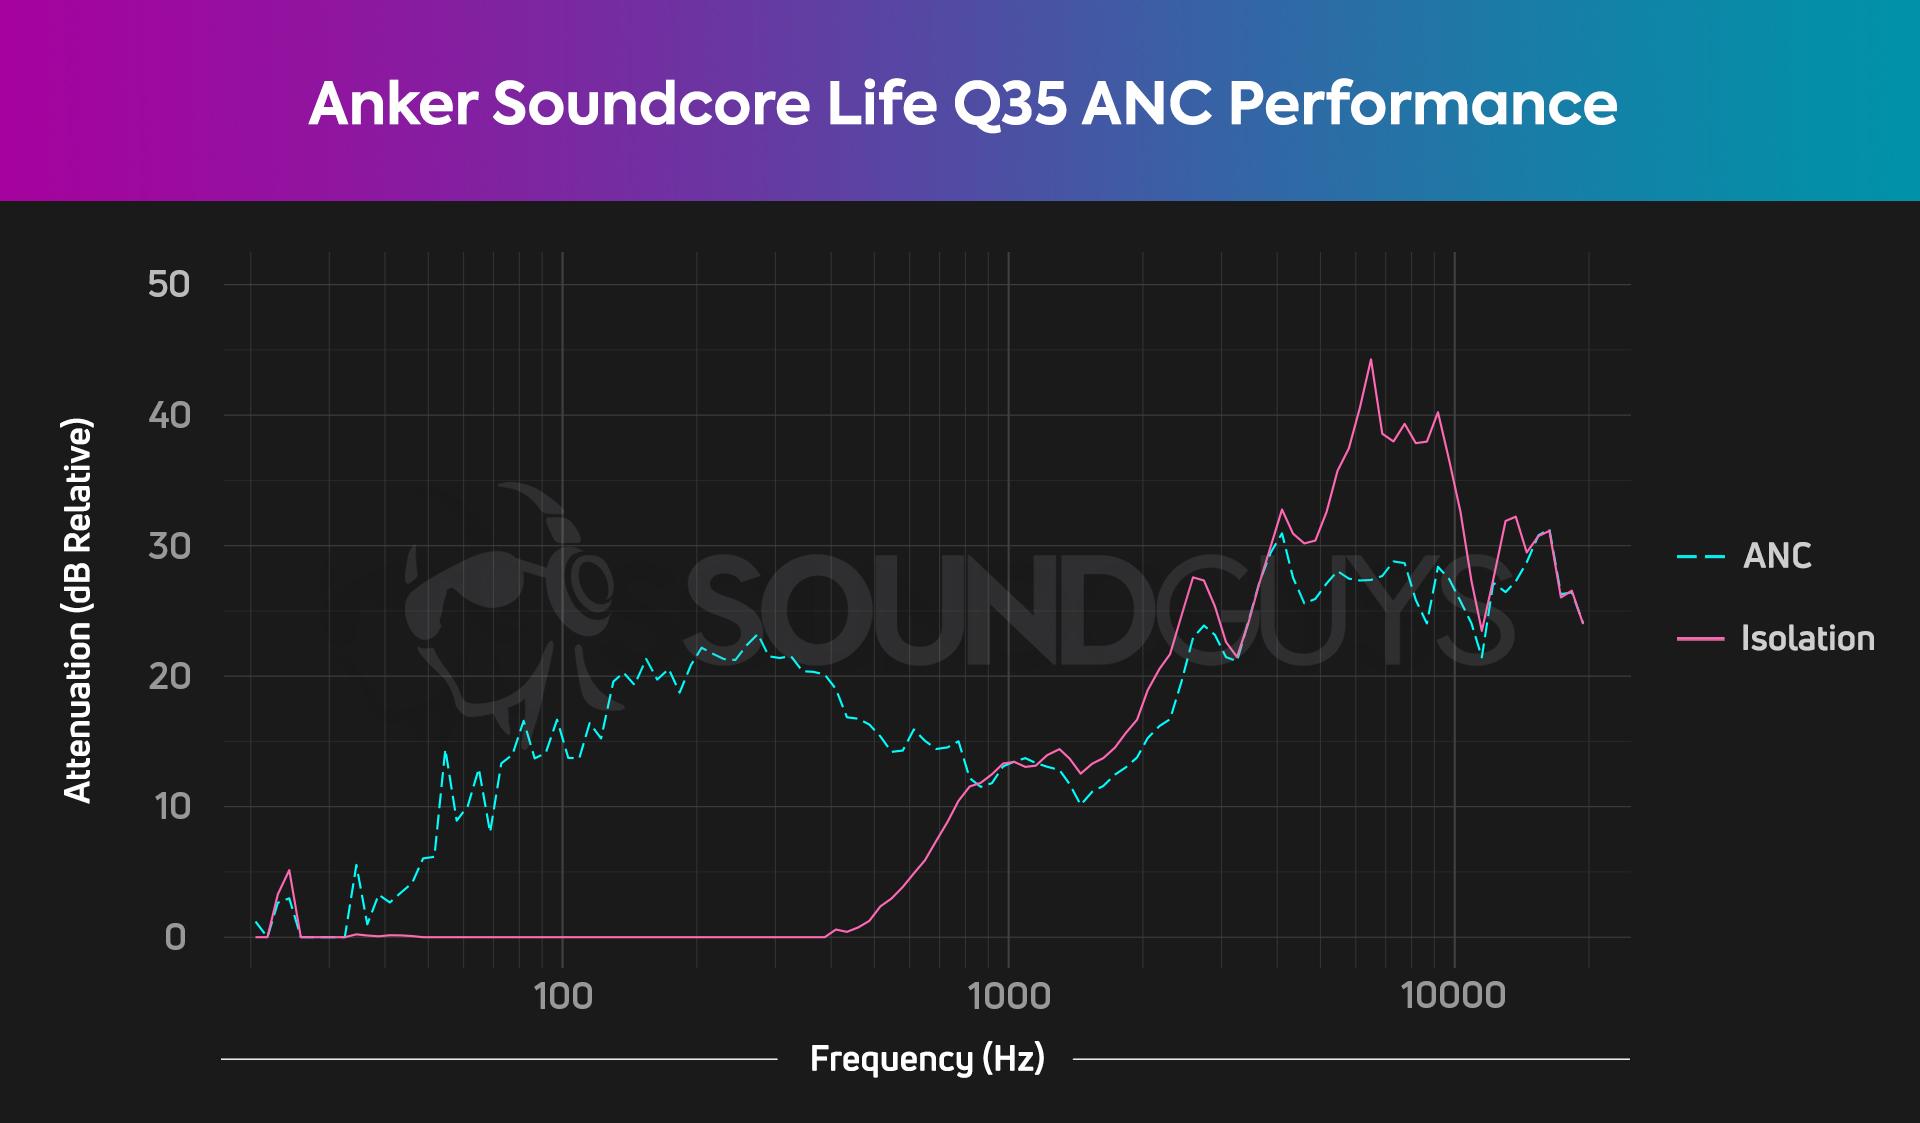 Anker Soundcore Life Q35 ANC Chart